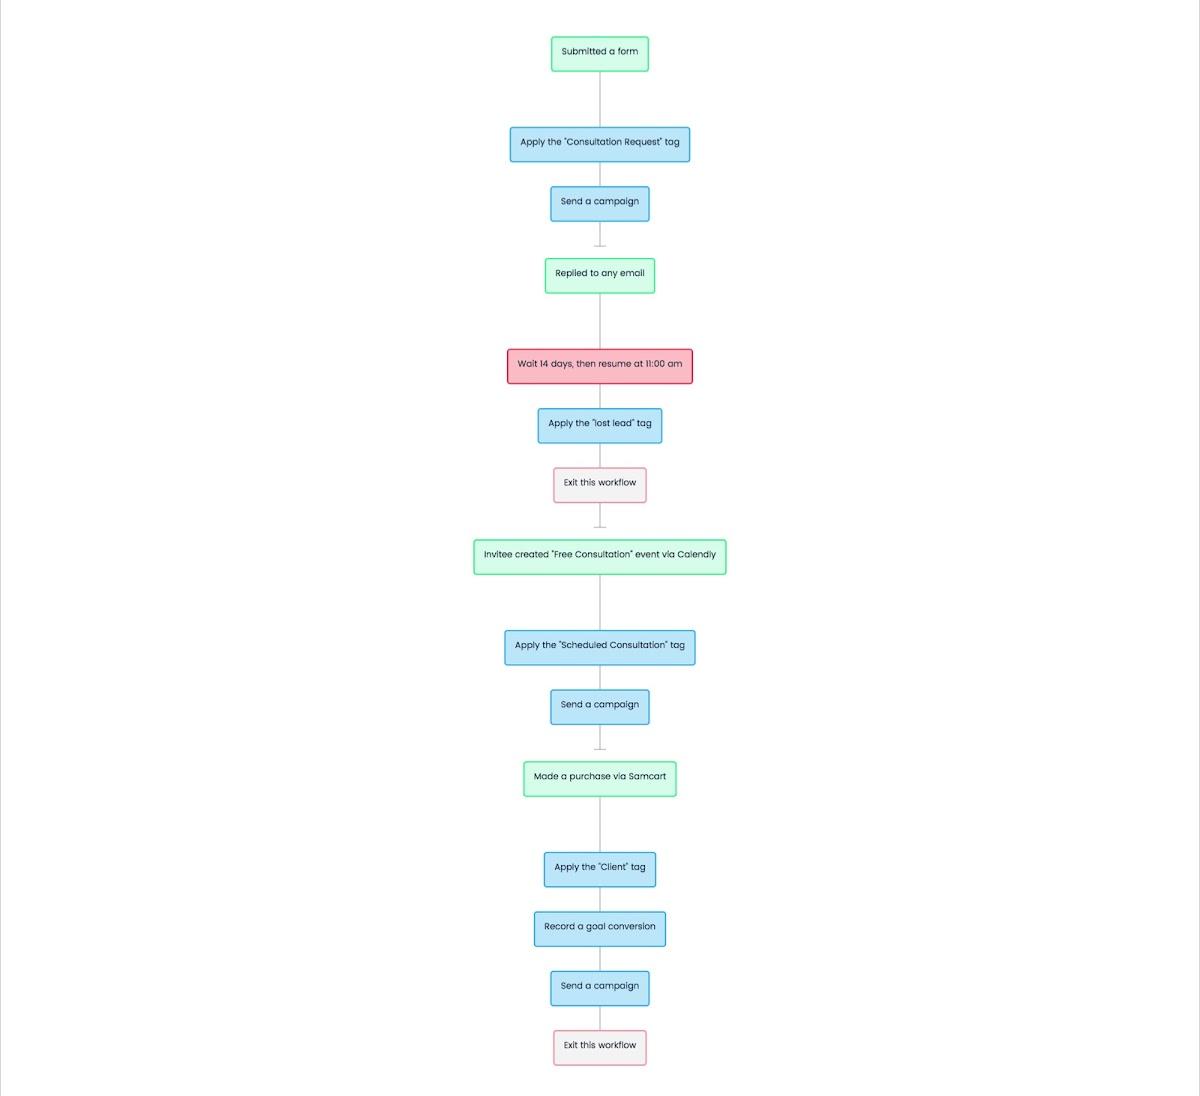 Schedule Consultation Calls - Workflow Diagram